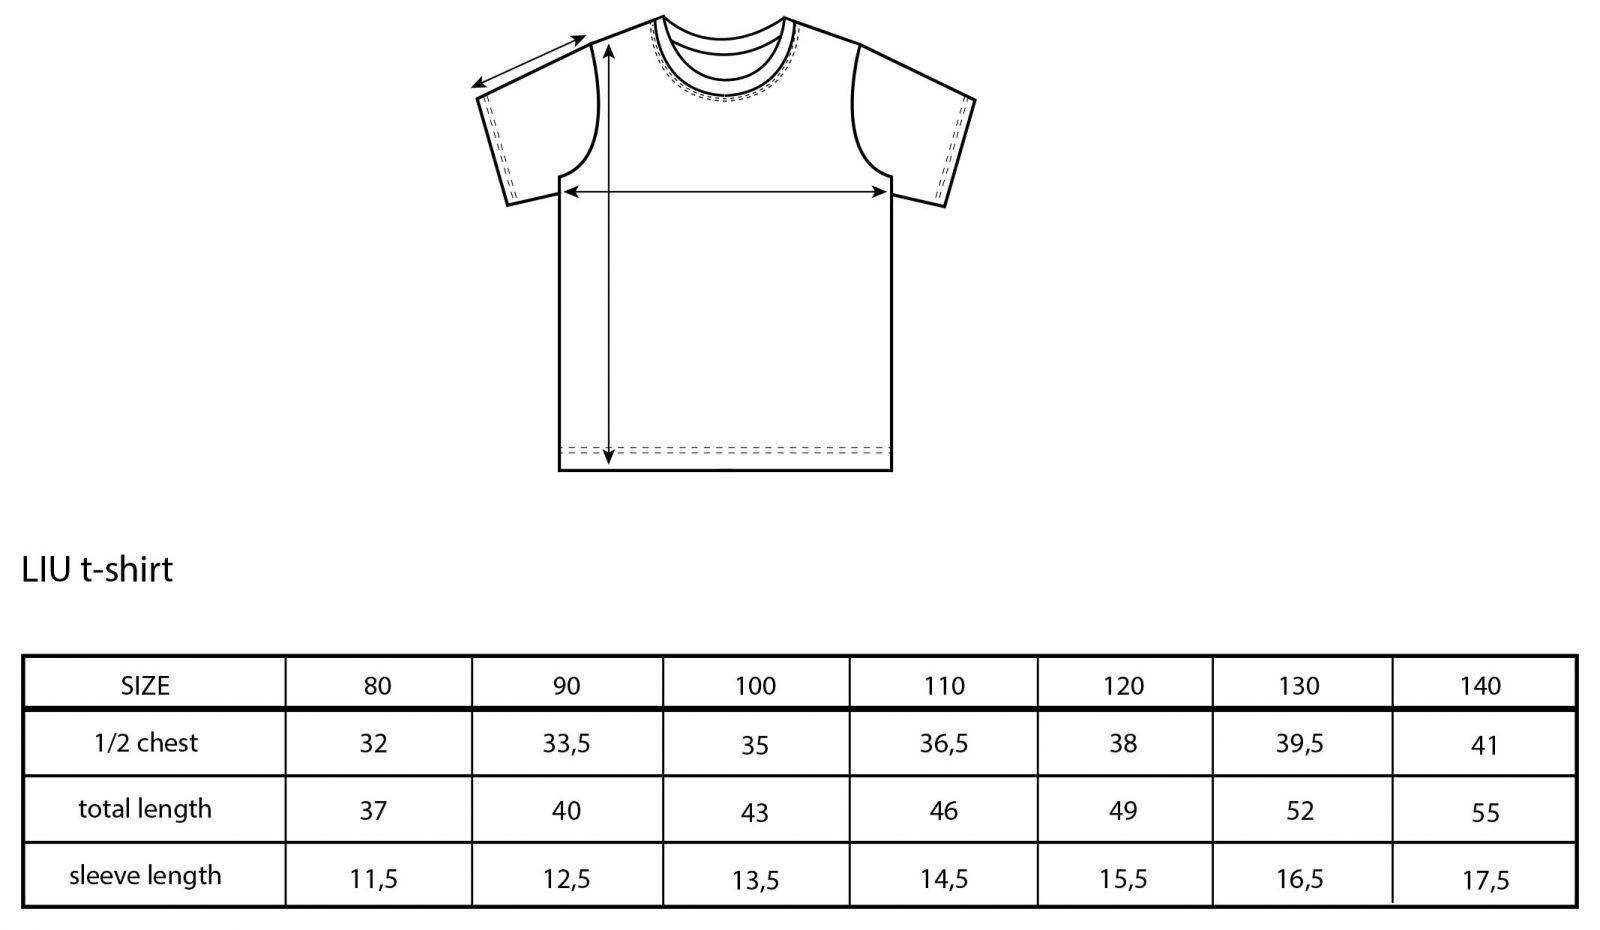 Vimma t-shirt LIU letti Pilvi 80-140cm - 80-140cm, braid, LIU, Pilvi, t-shirt